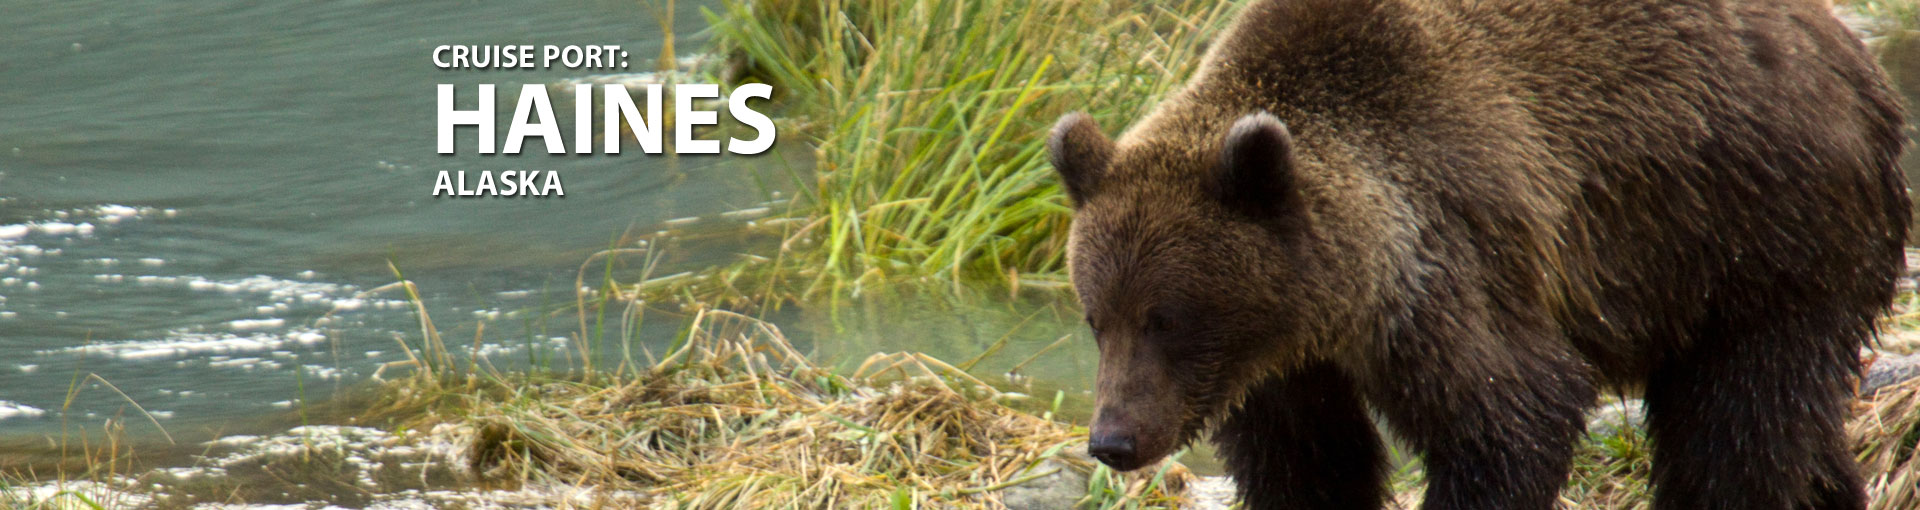 Cruises to Haines, Alaska